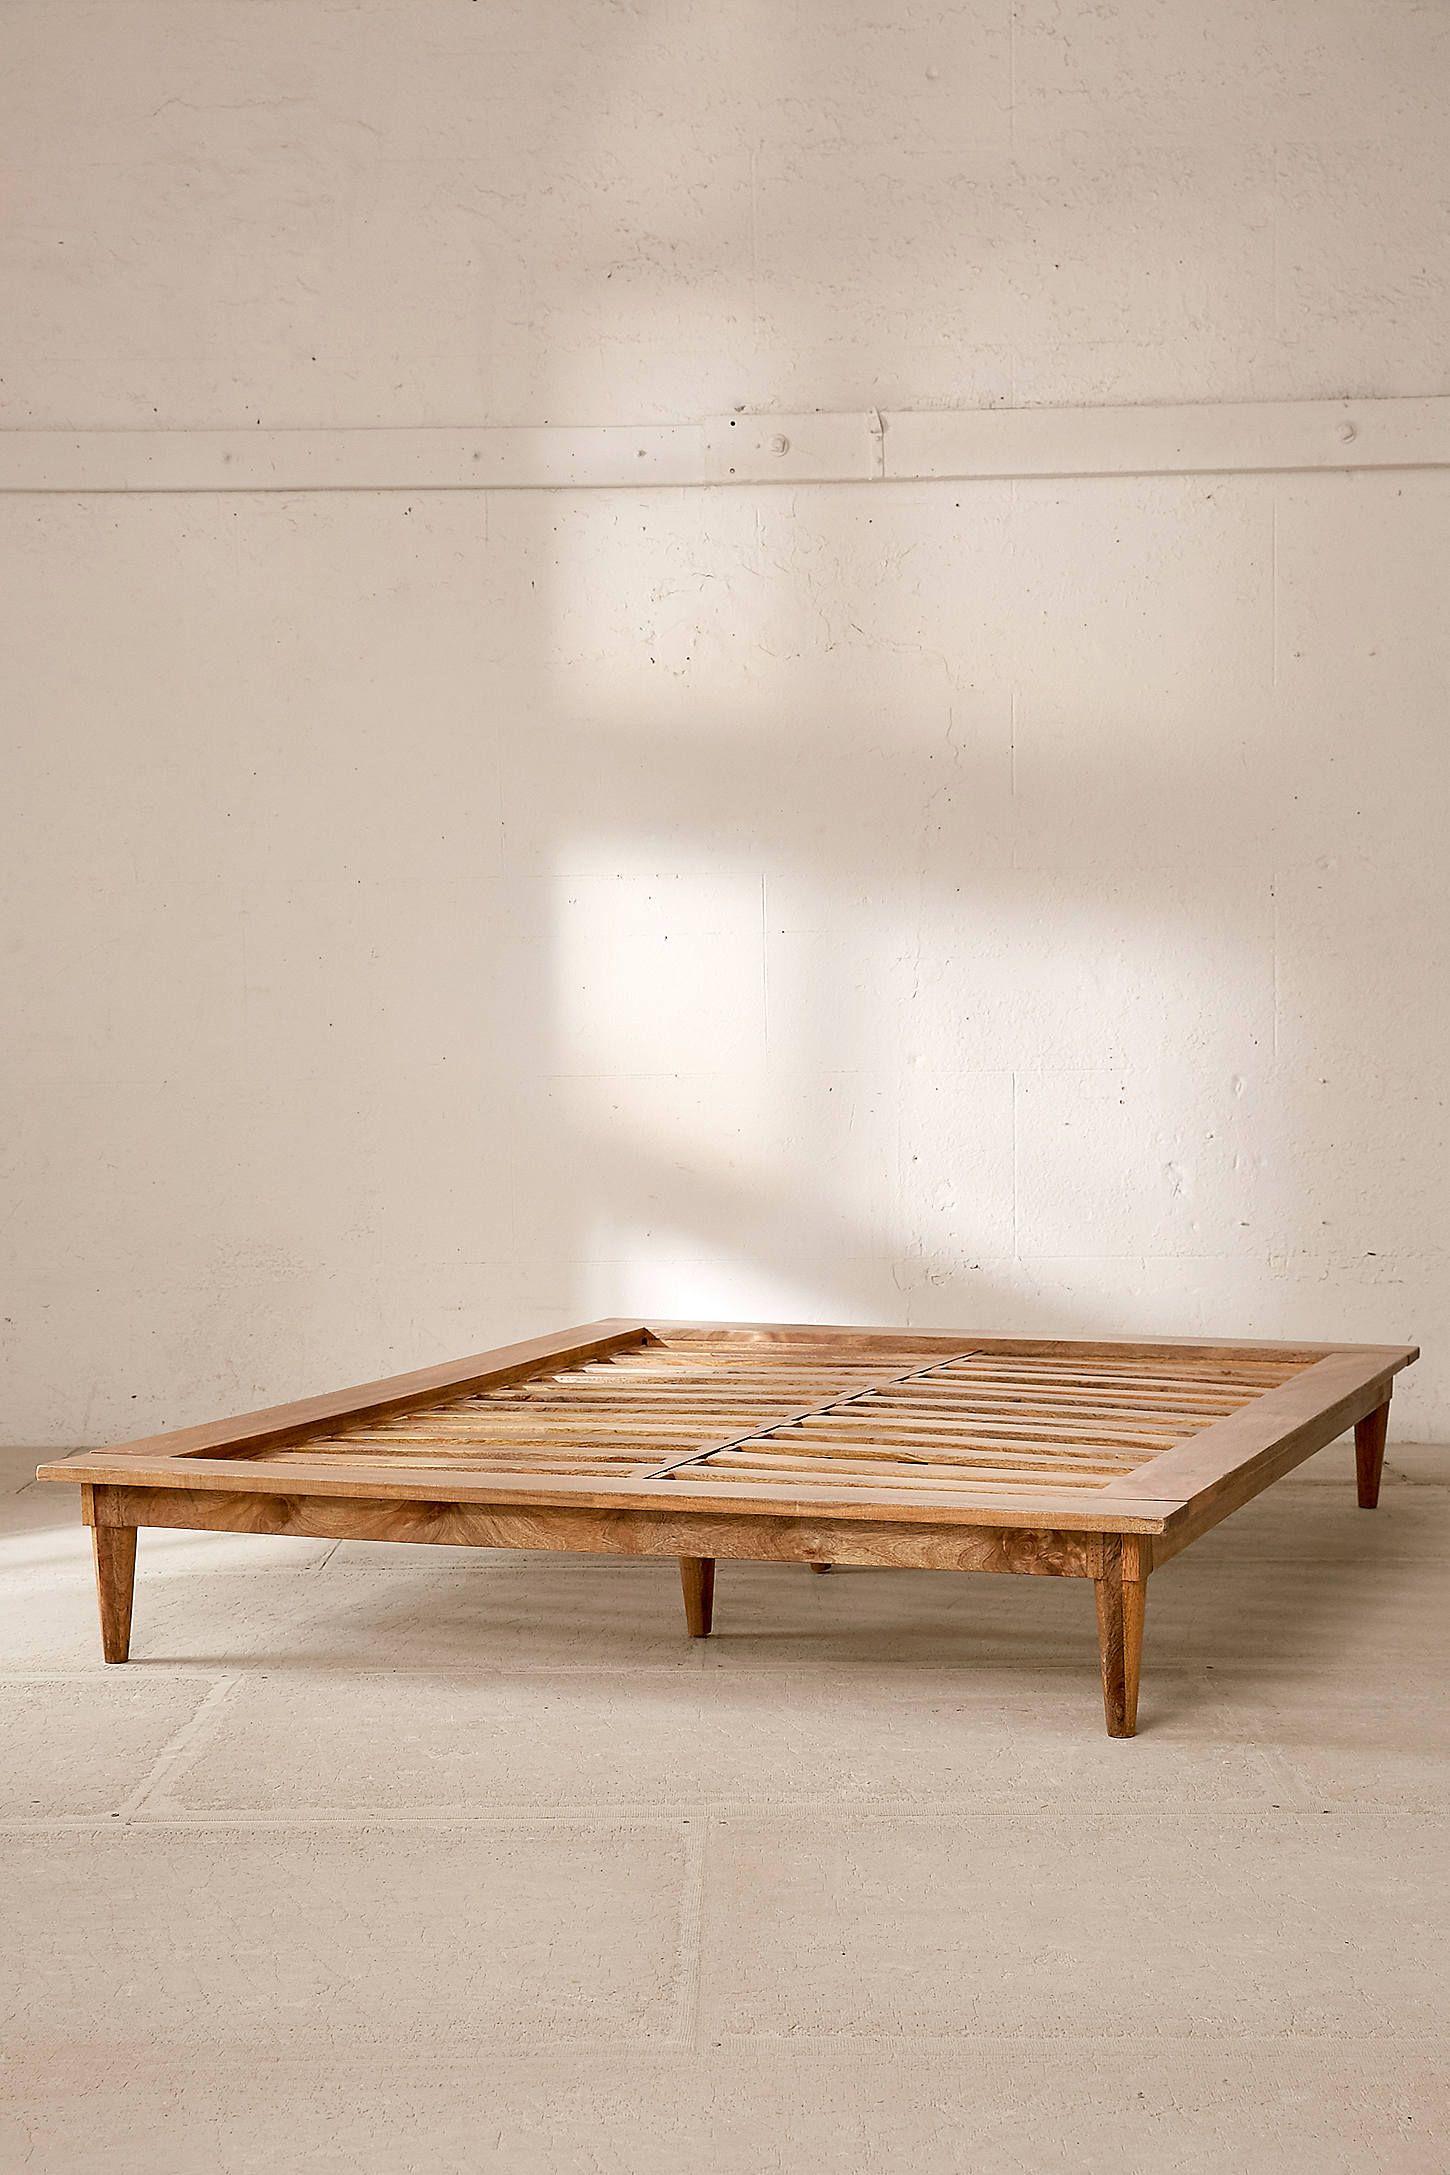 Nett Nomad Bettrahmen Galerie - Benutzerdefinierte Bilderrahmen ...